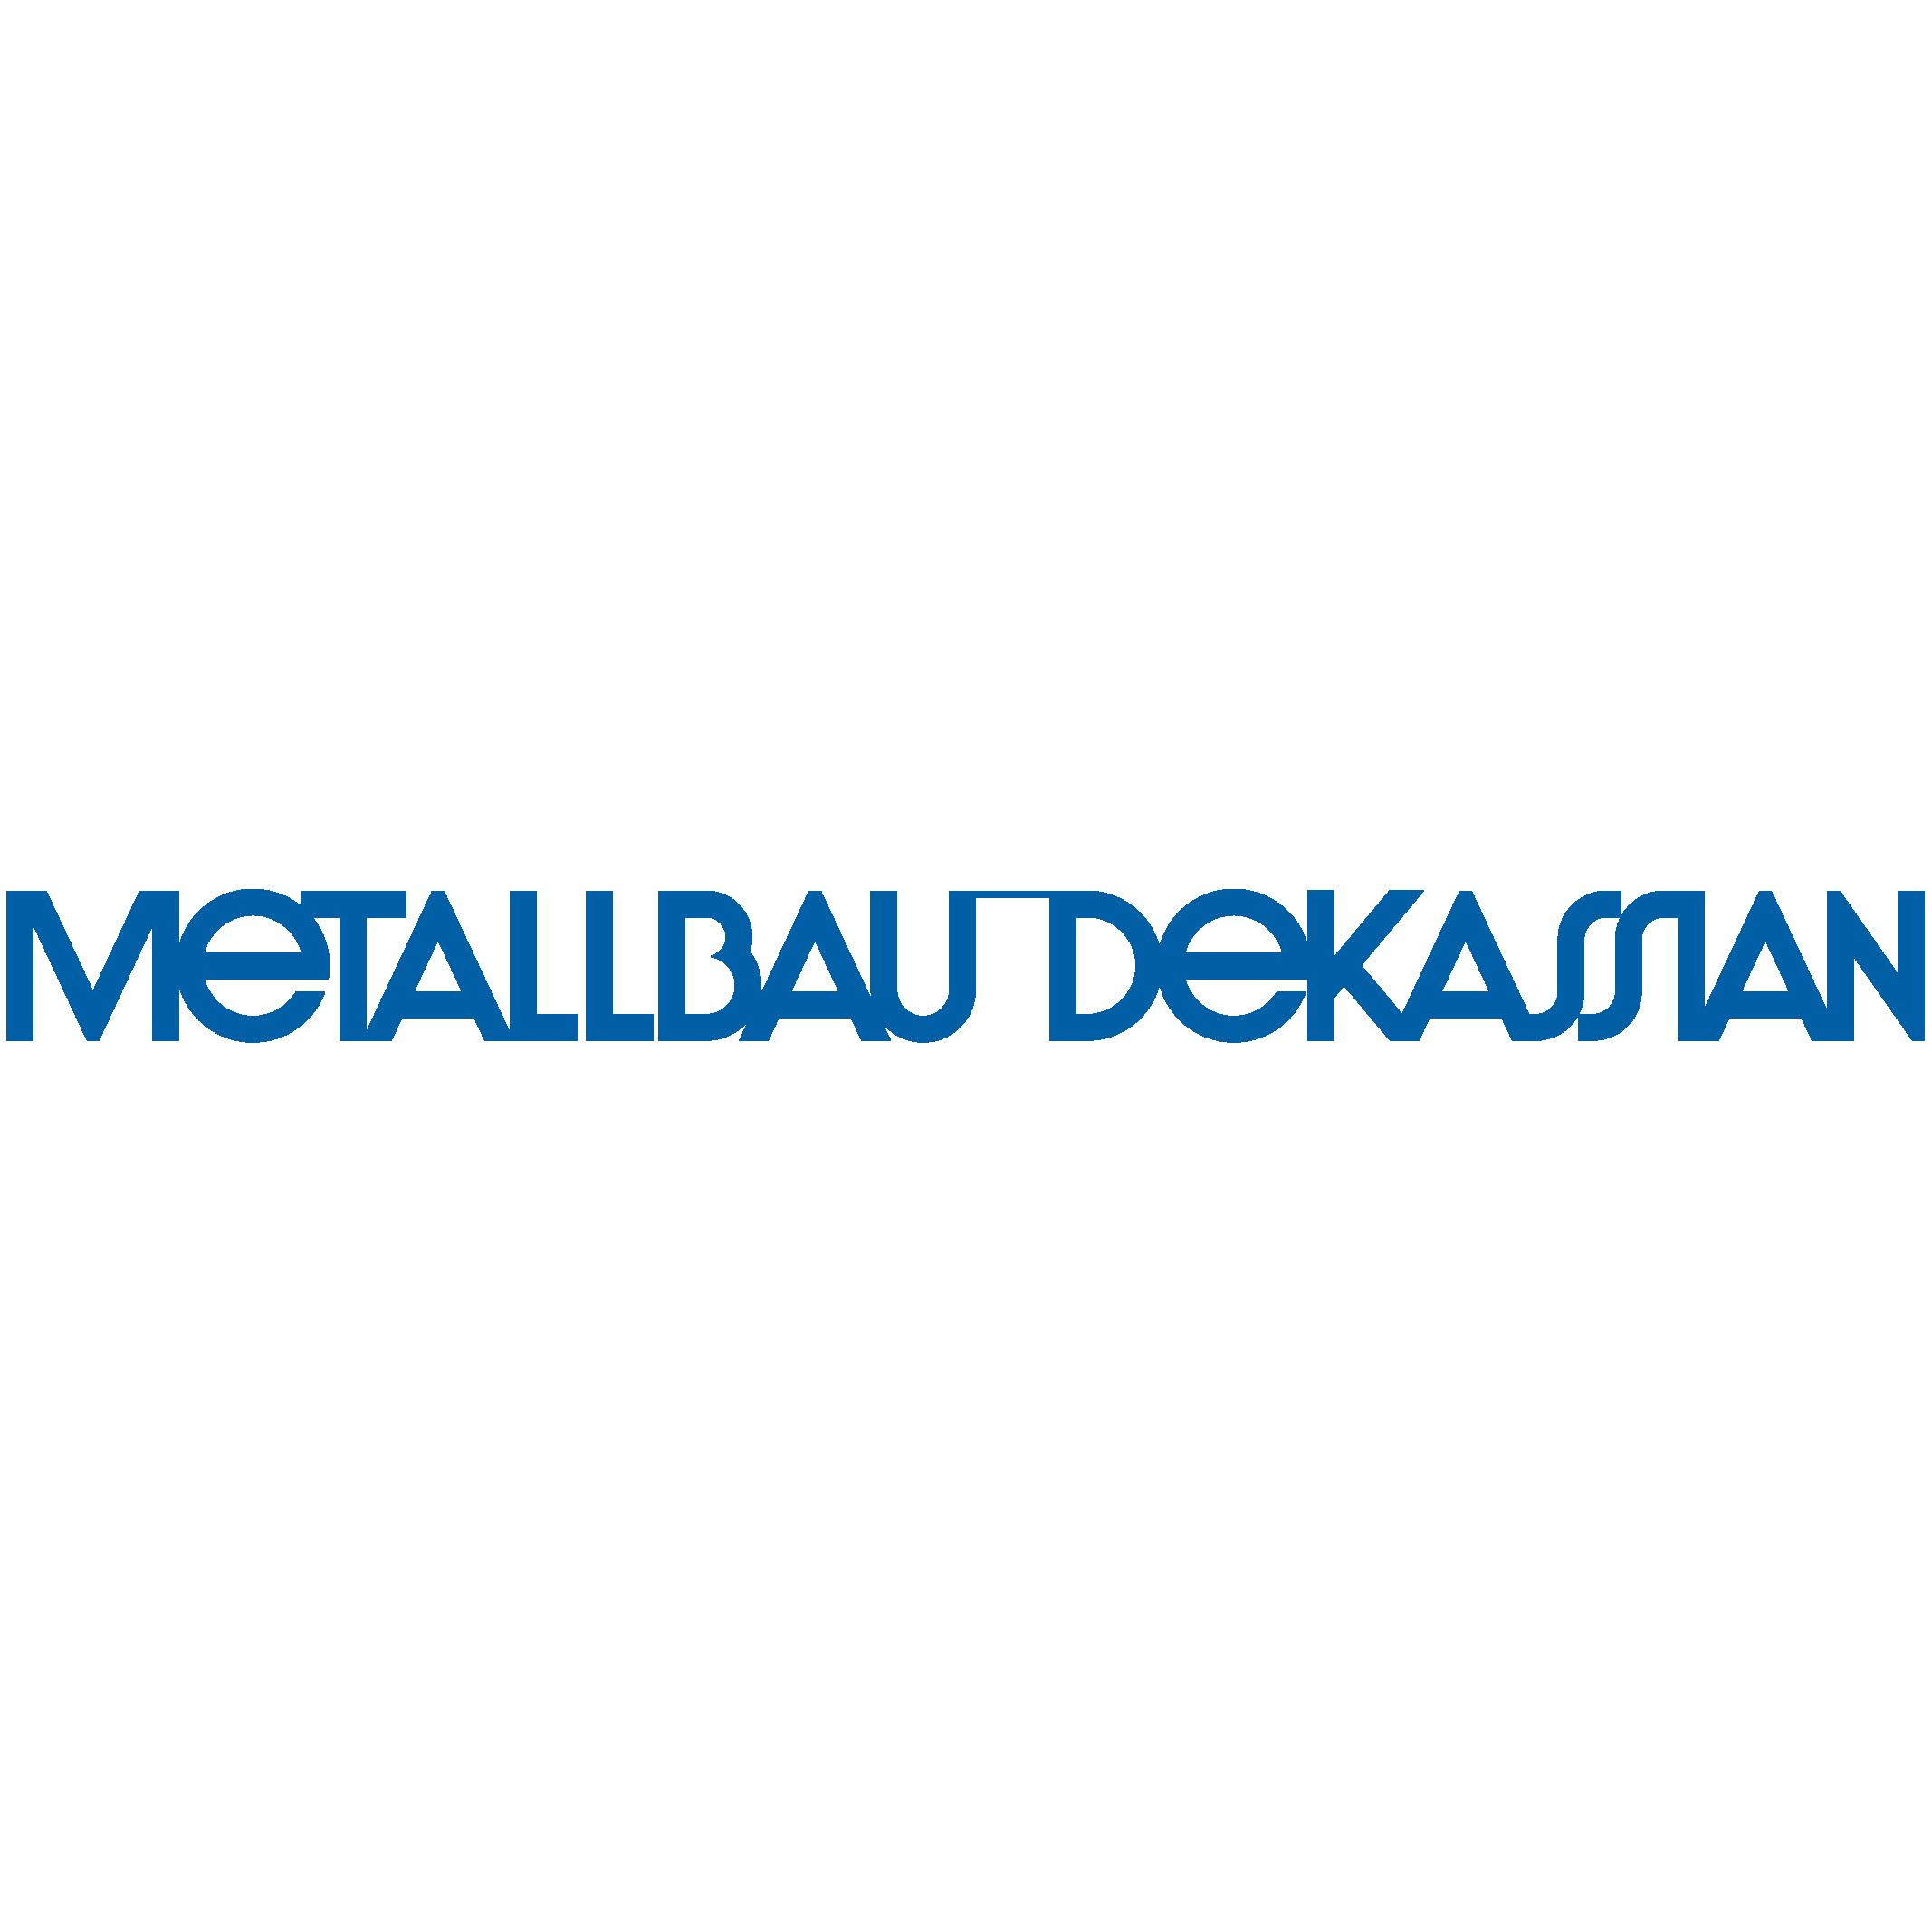 https://www.influxmediahouse.com/wp-content/uploads/2019/01/Logo_MBD-colour.png